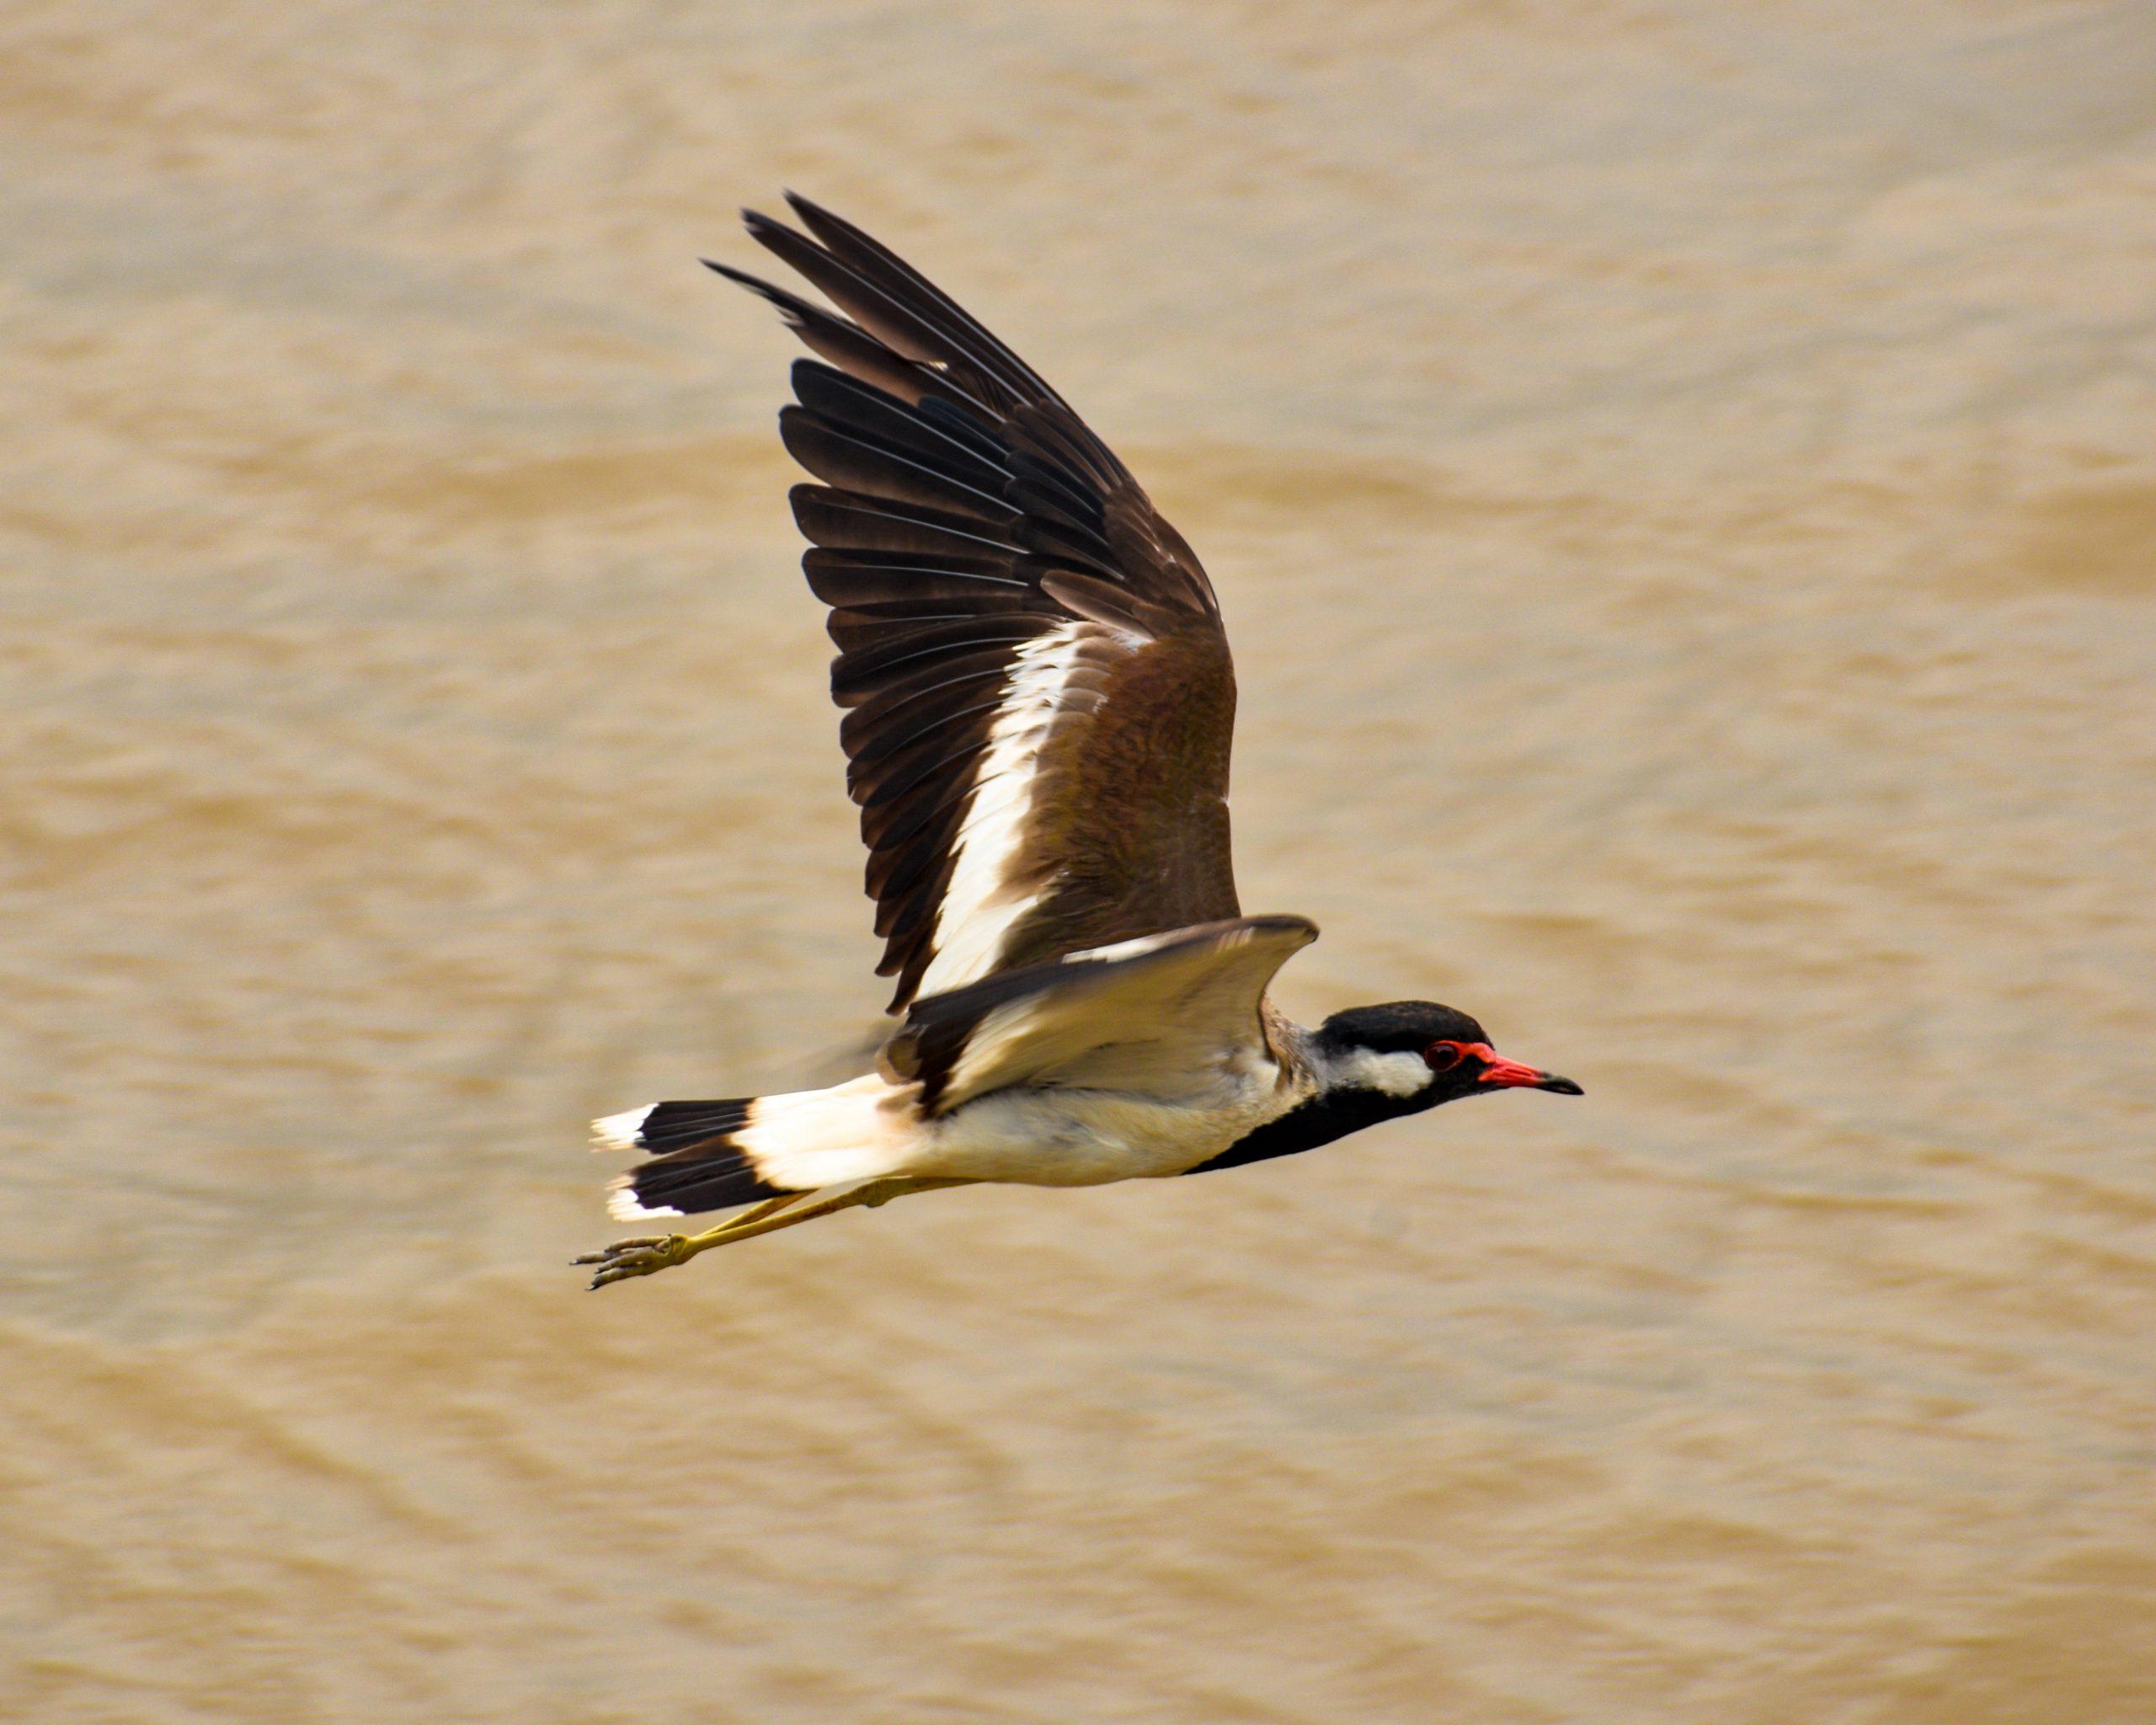 Red-wattled lapwing taking flight.